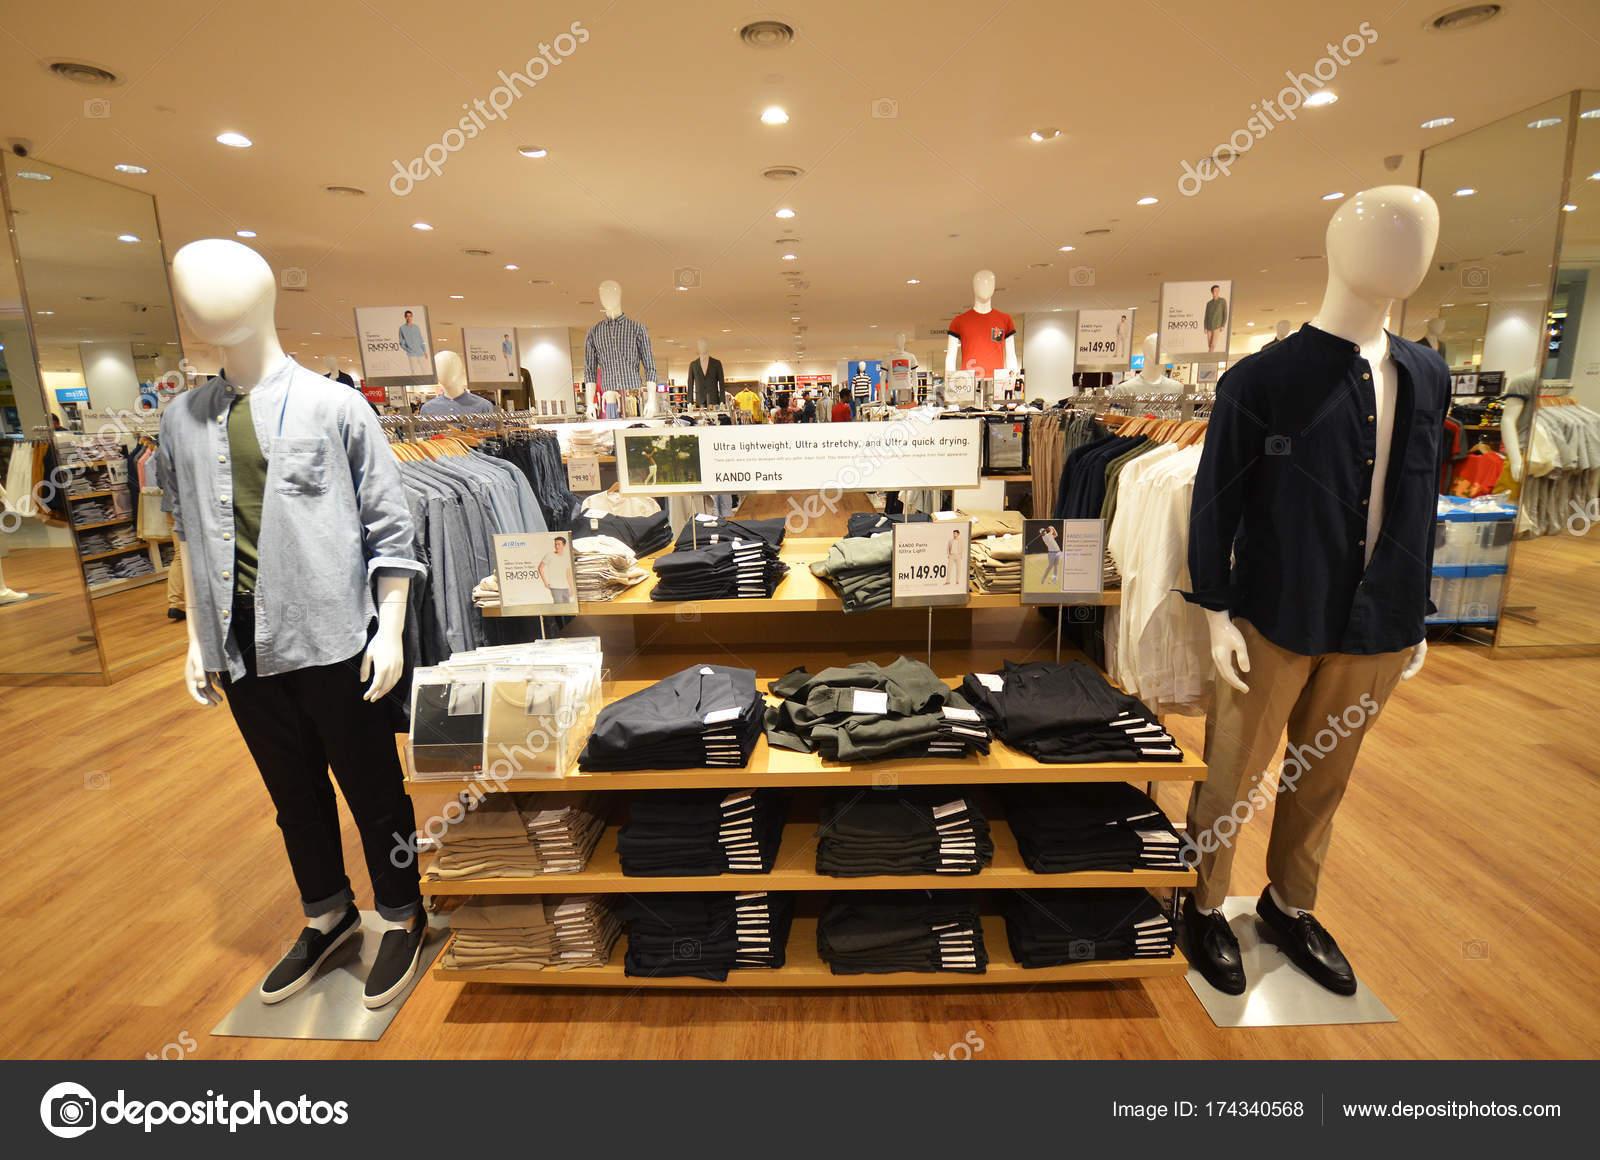 uniqlo store located in kota kinabalu stock photo